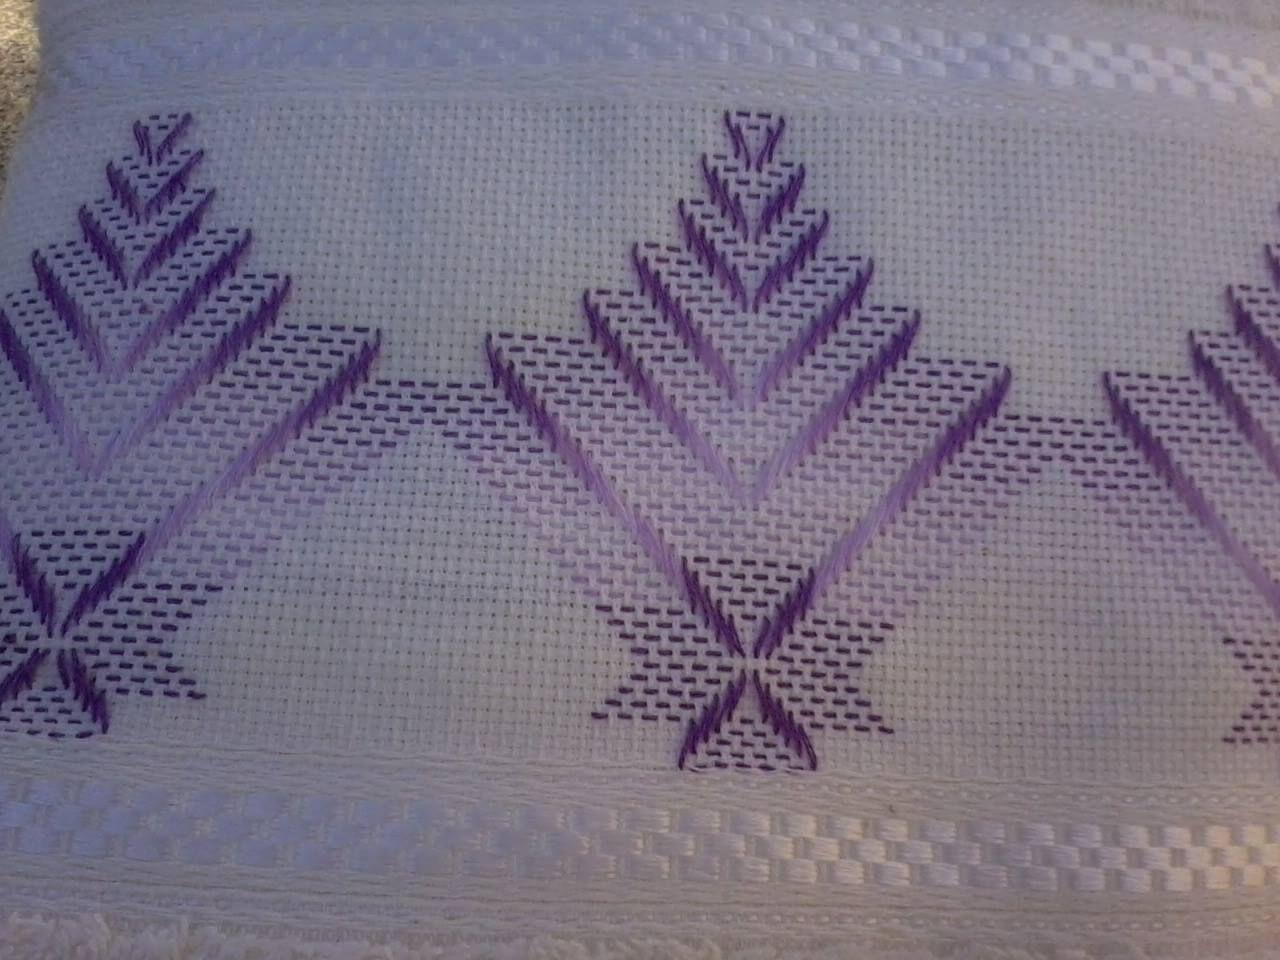 Vagonite - Huck weaving | bordados. | Pinterest | Lindo, Encontrado ...